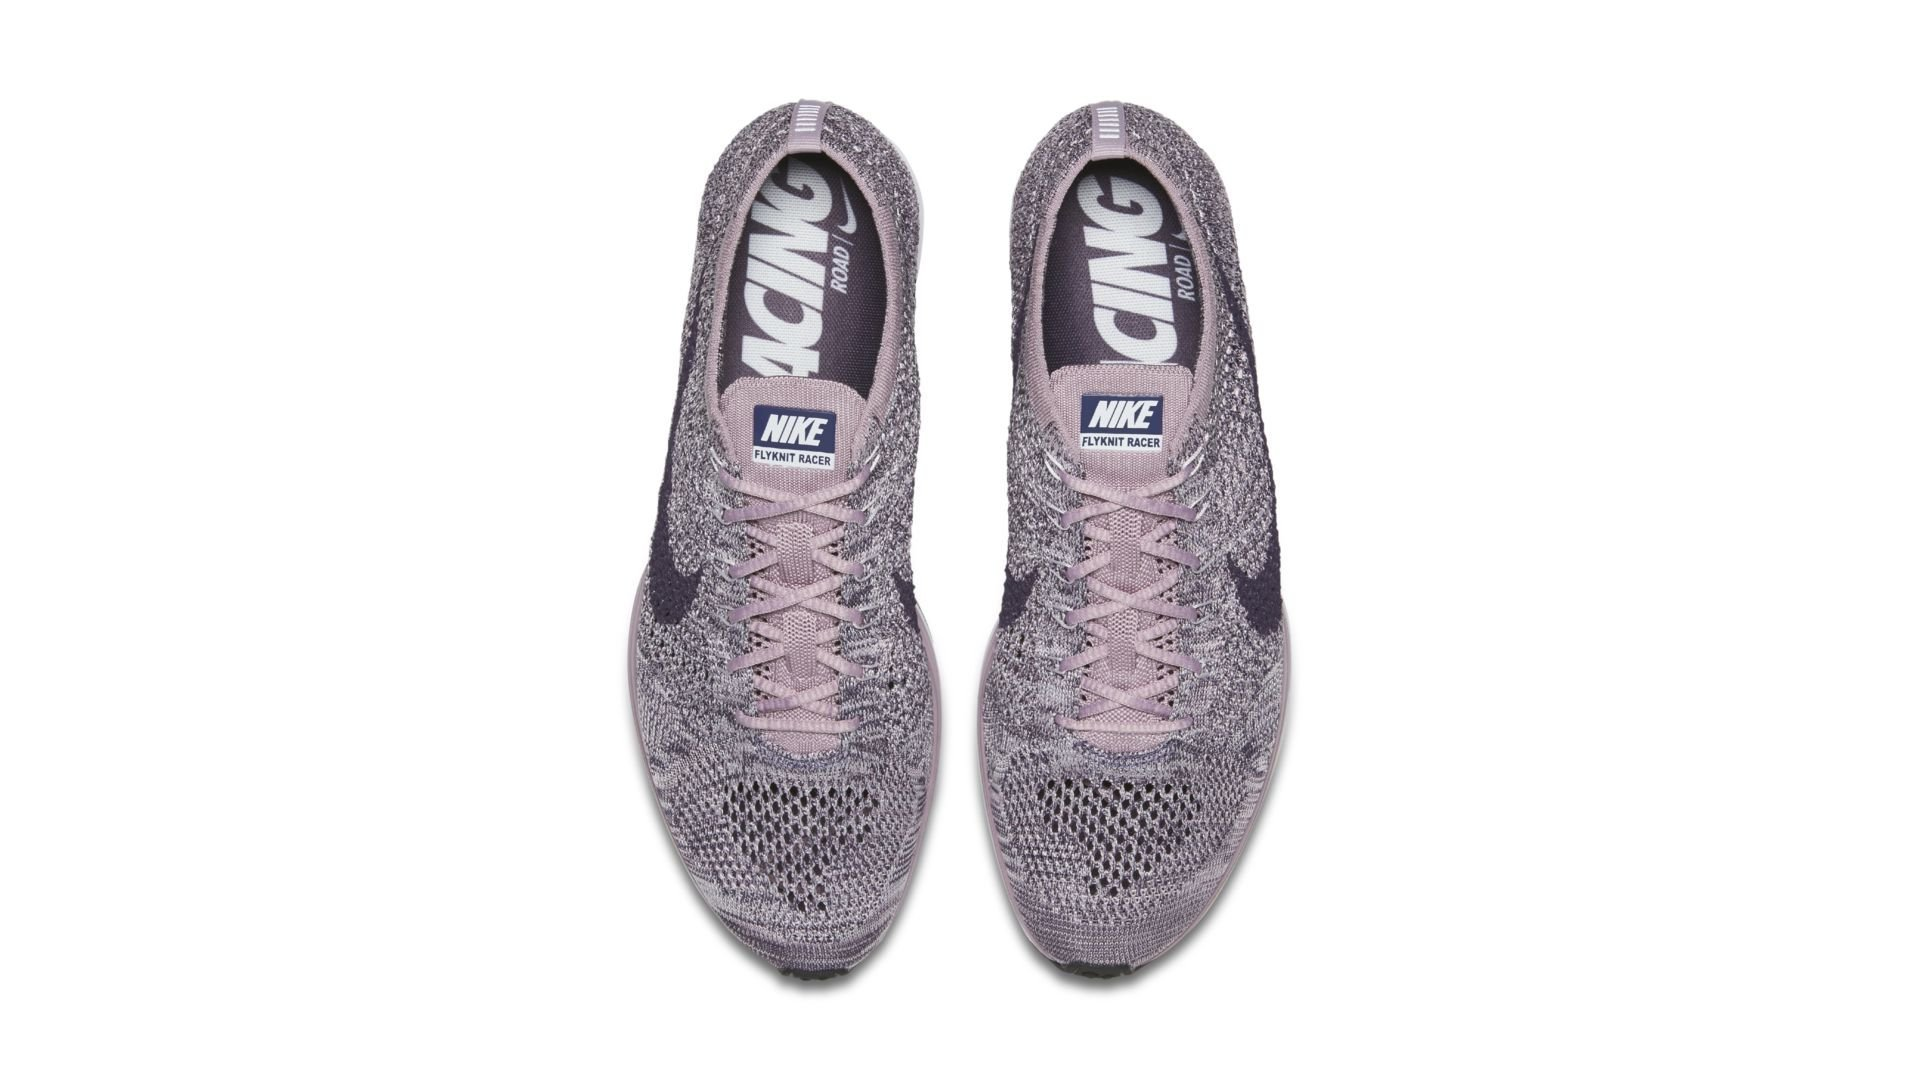 Nike Flyknit Racer Macaron Pack Lavender (526628-500)